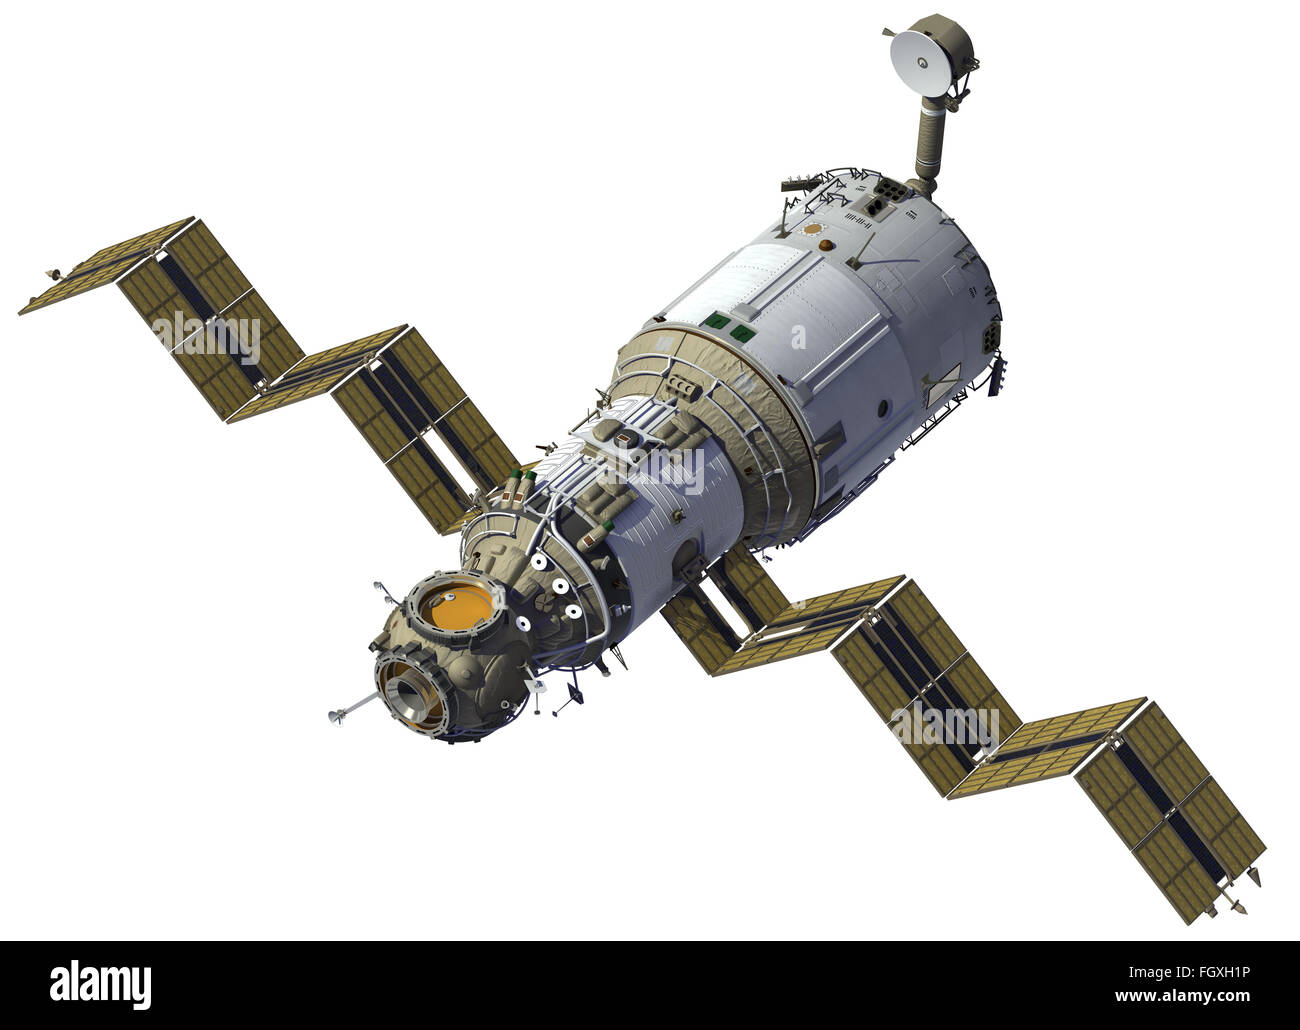 Space Station Deploys Solar Panels. 3D Model. - Stock Image